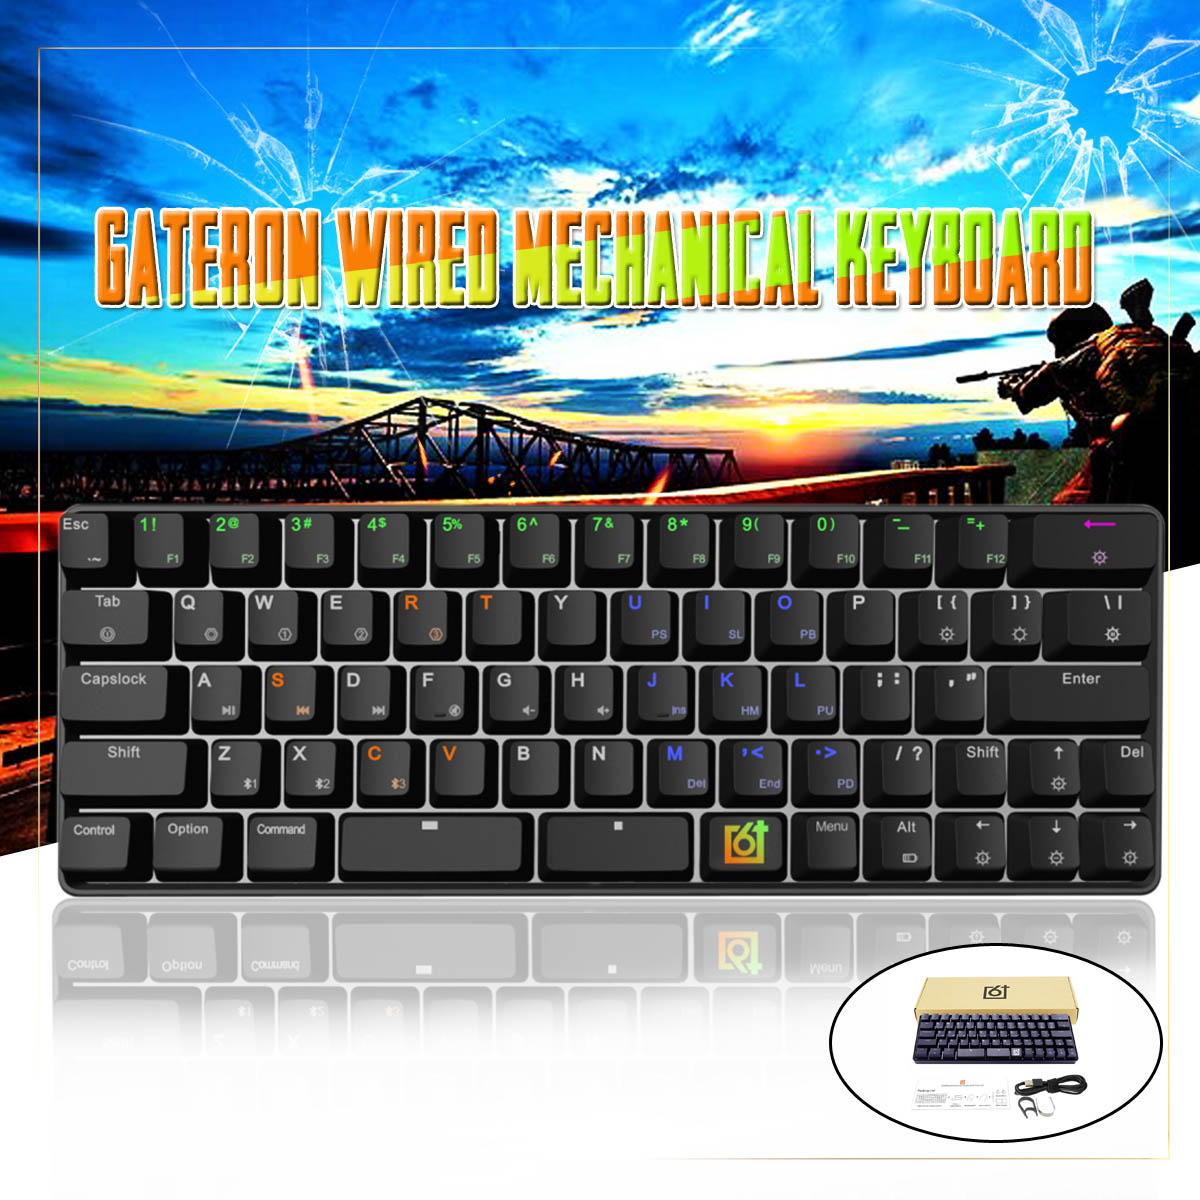 Gateron Optical Switch GK66 USB-C Wired Split-Spacebar Hot-swappable RGB Mechanical Gaming Keyboard